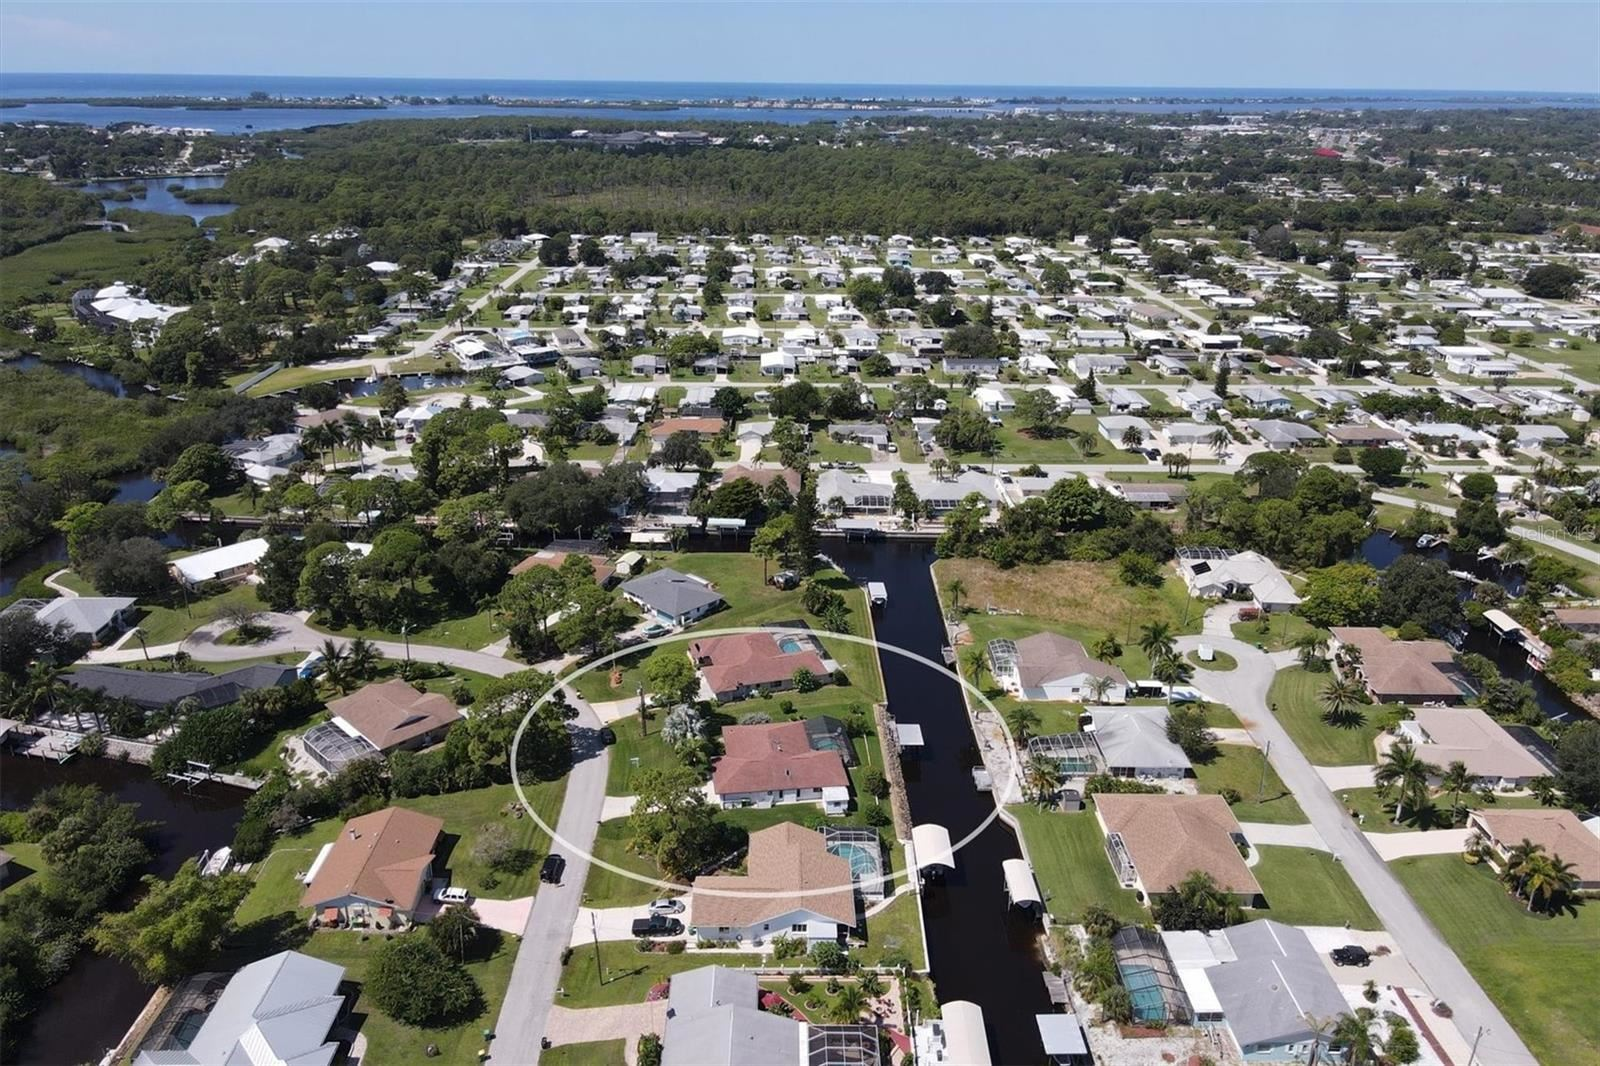 Photo of 2672 TITANIA ROAD, ENGLEWOOD, FL 34224 (MLS # D6121394)